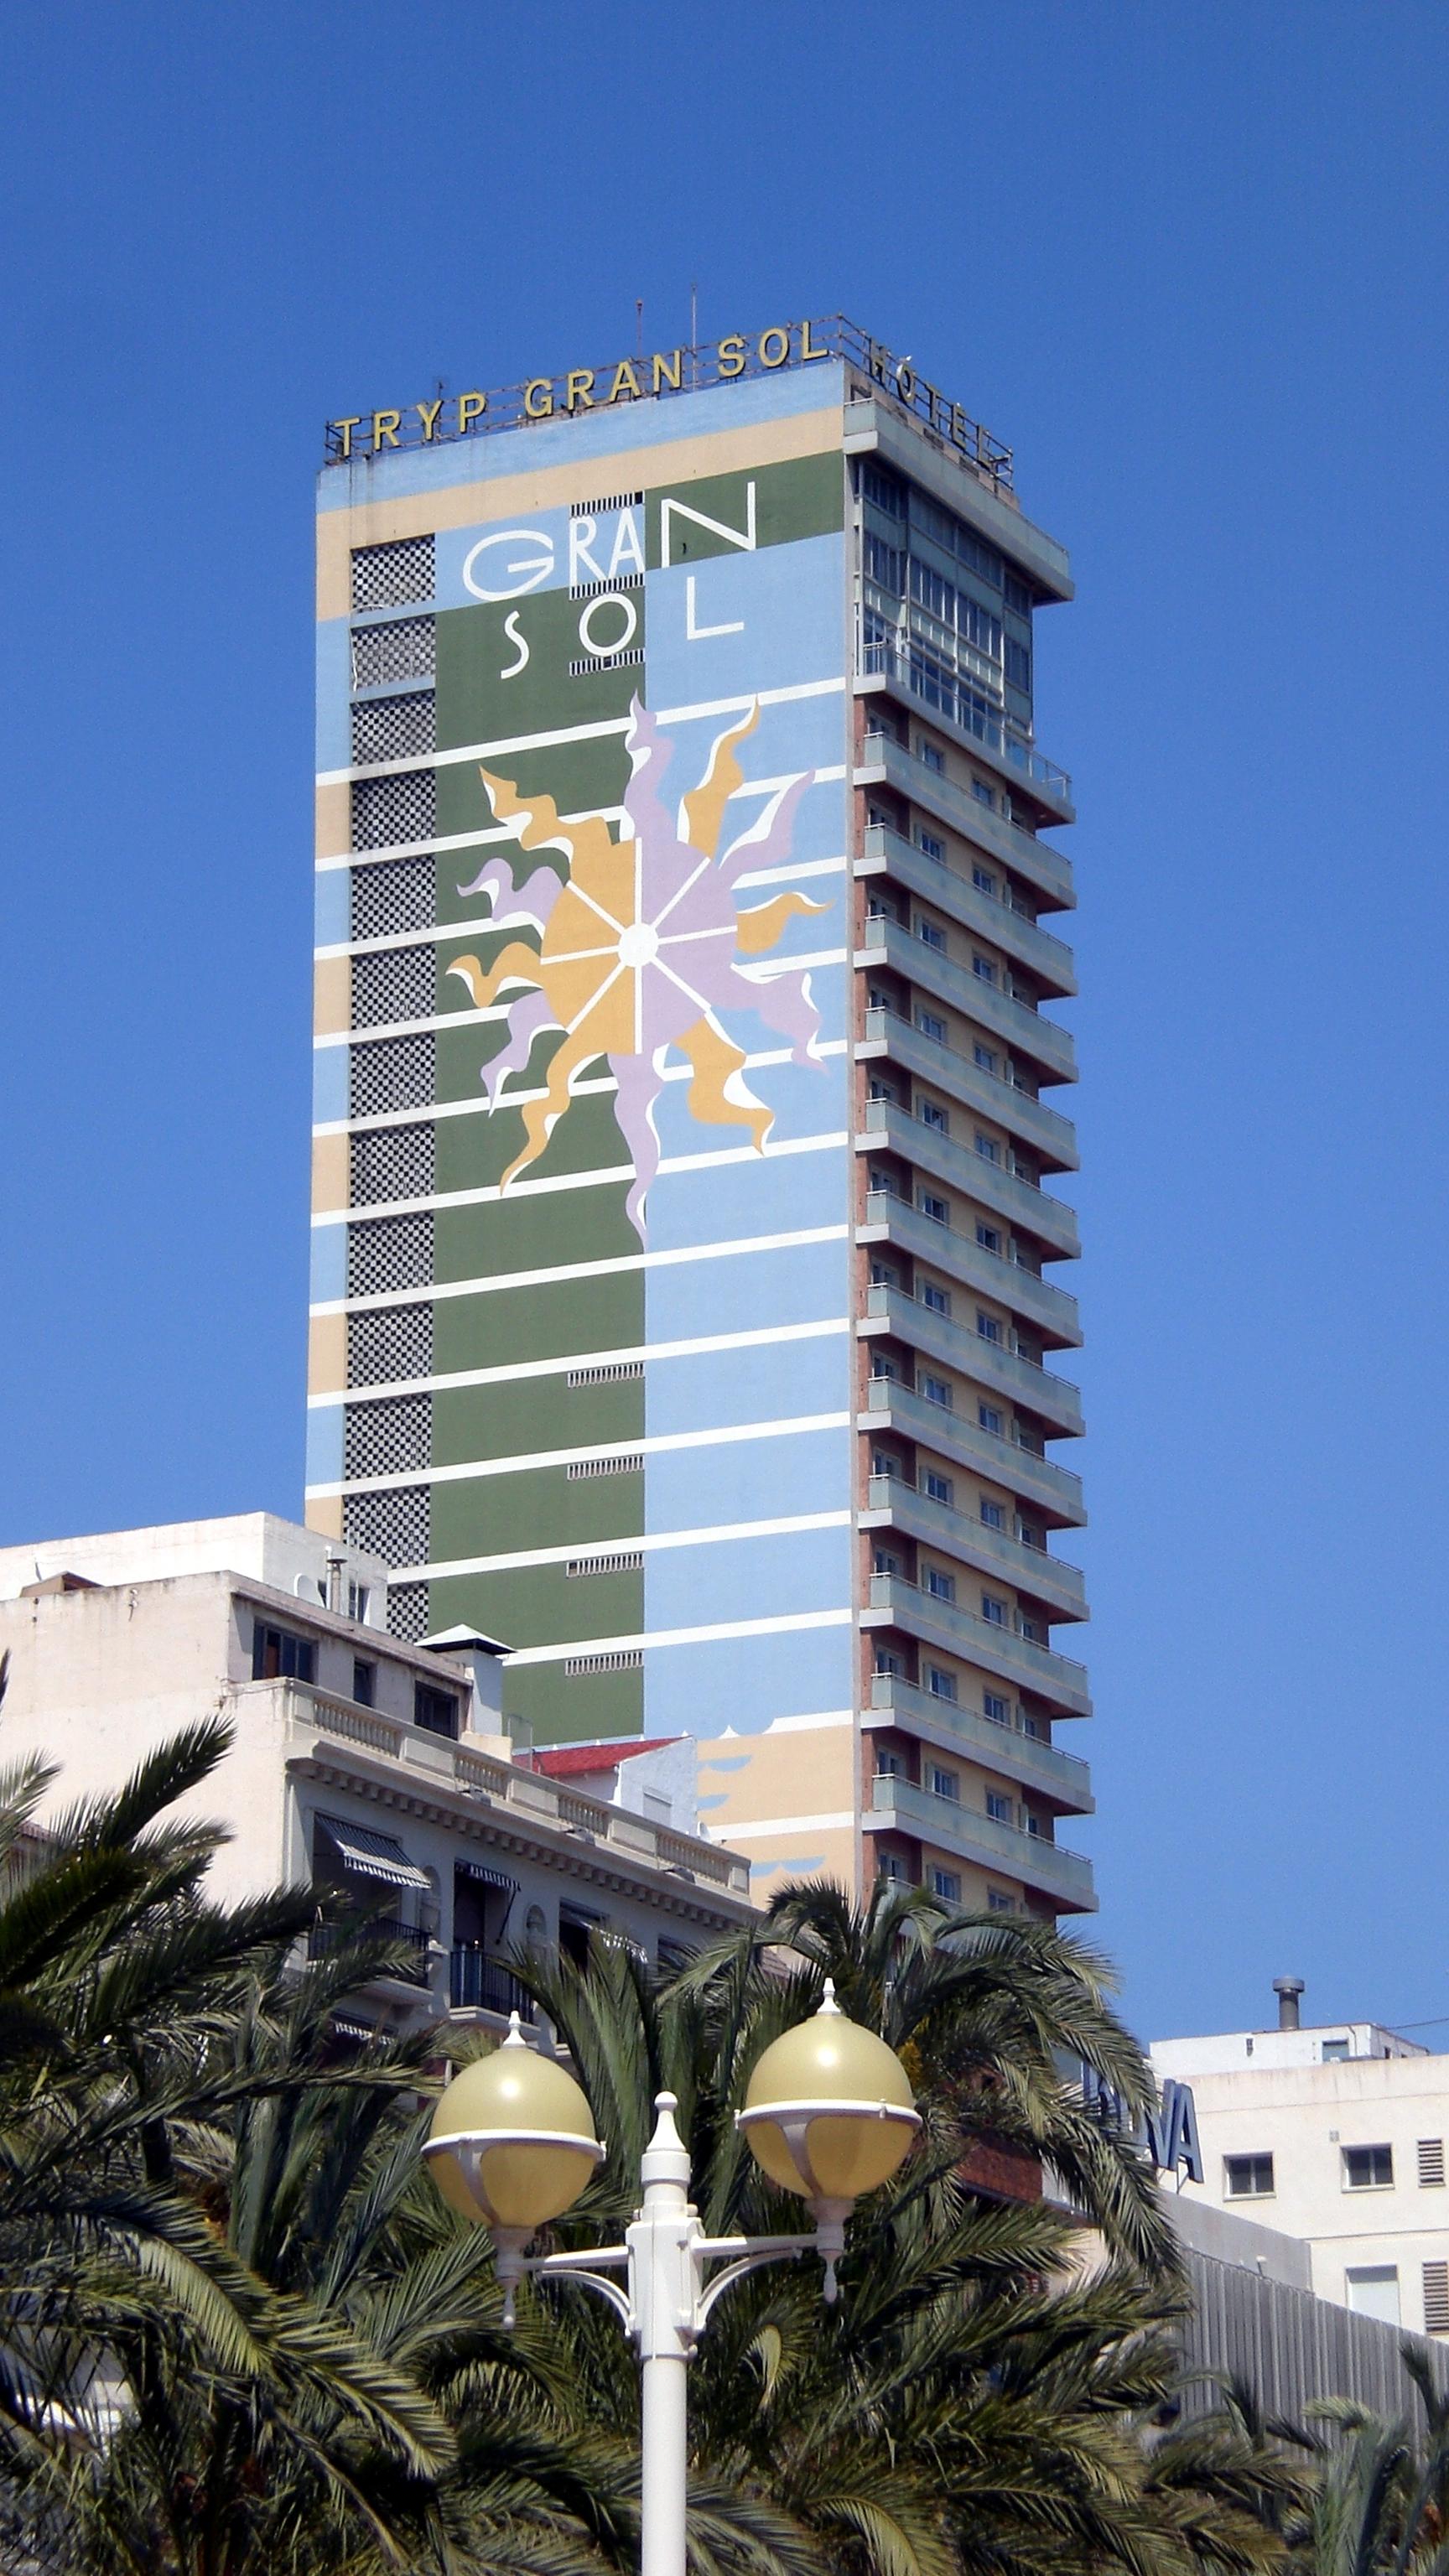 hotel gran sol alicante: